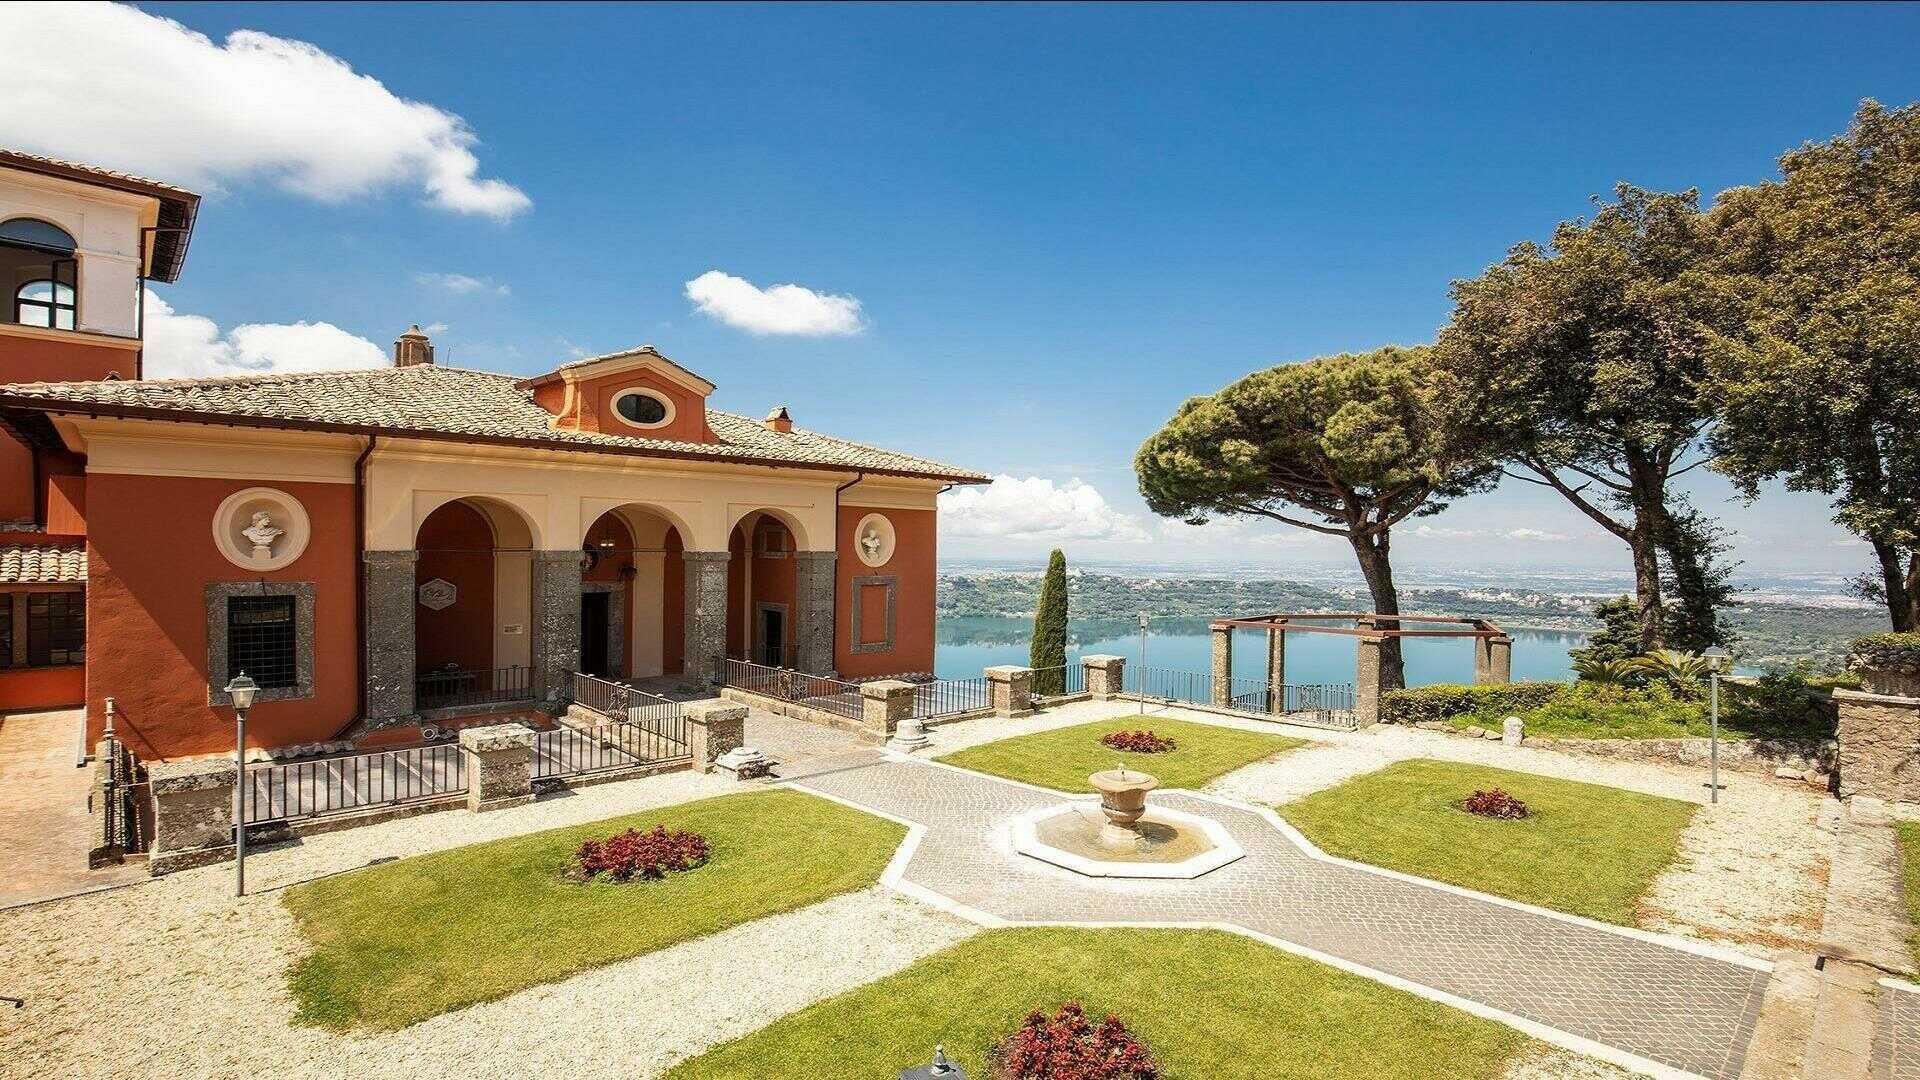 Meeting Rooms At Villa Del Cardinale Rocca Di Papa